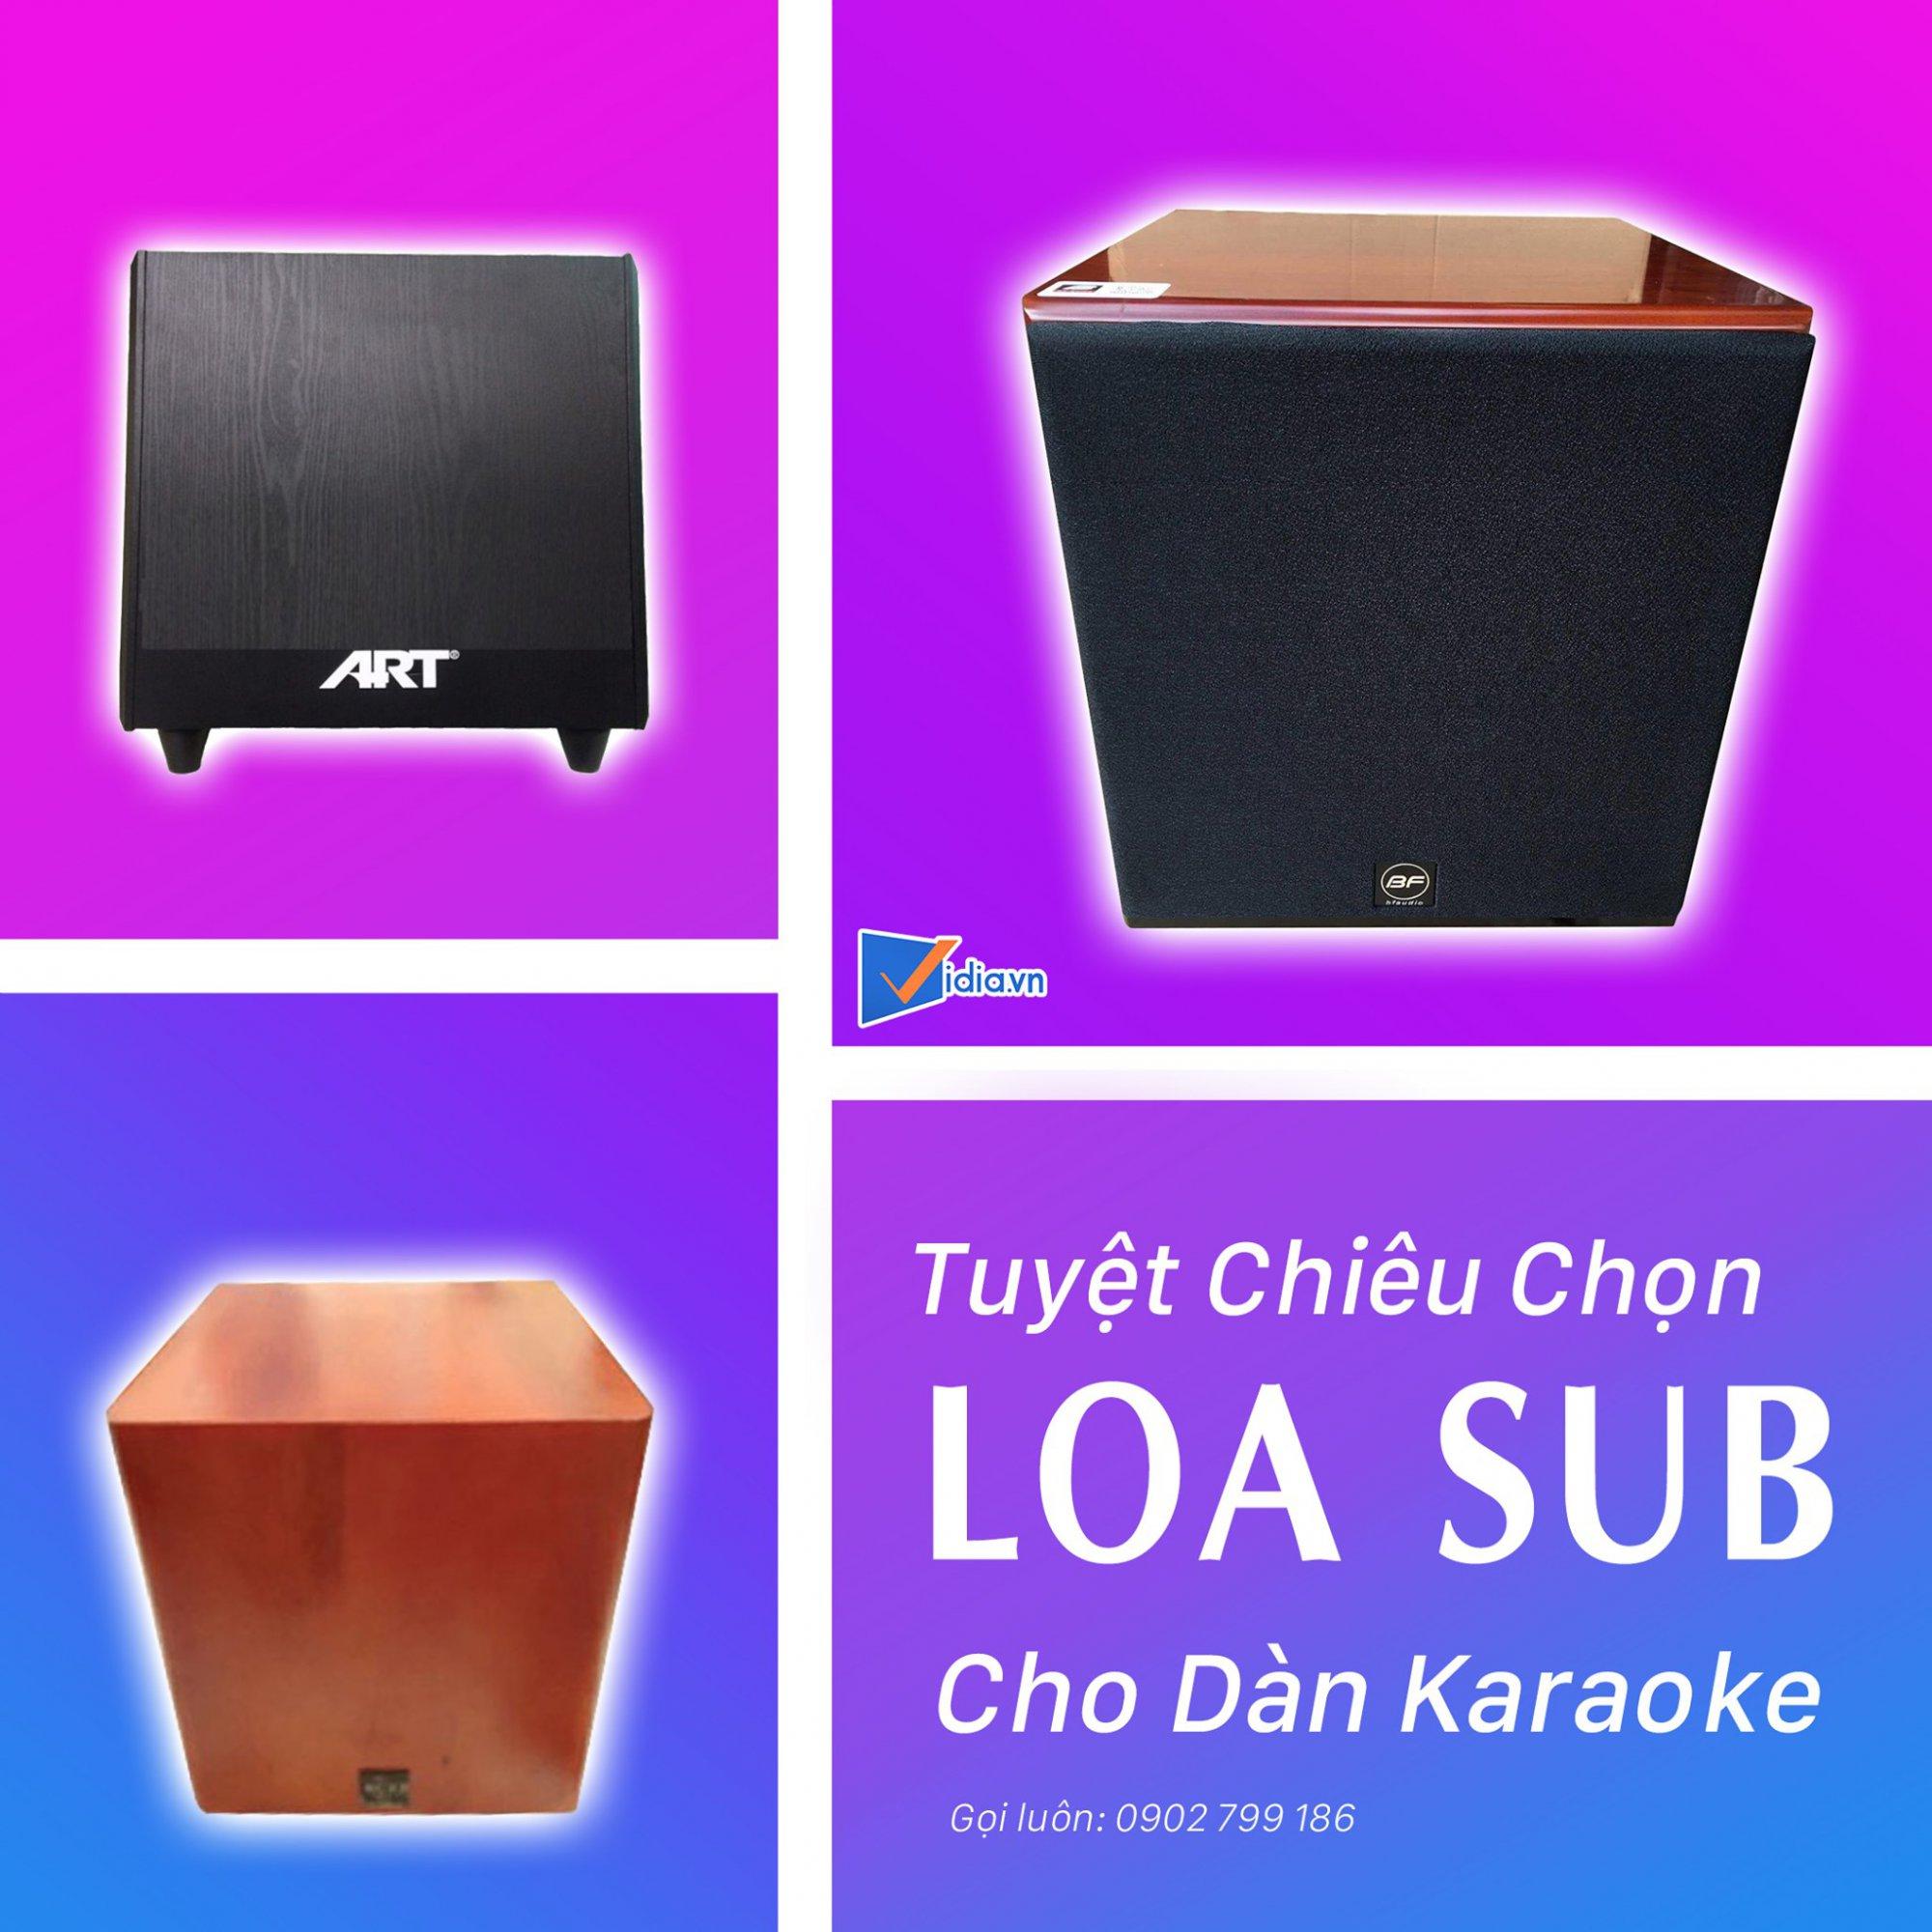 tuyet-chieu-chon-loa-sub